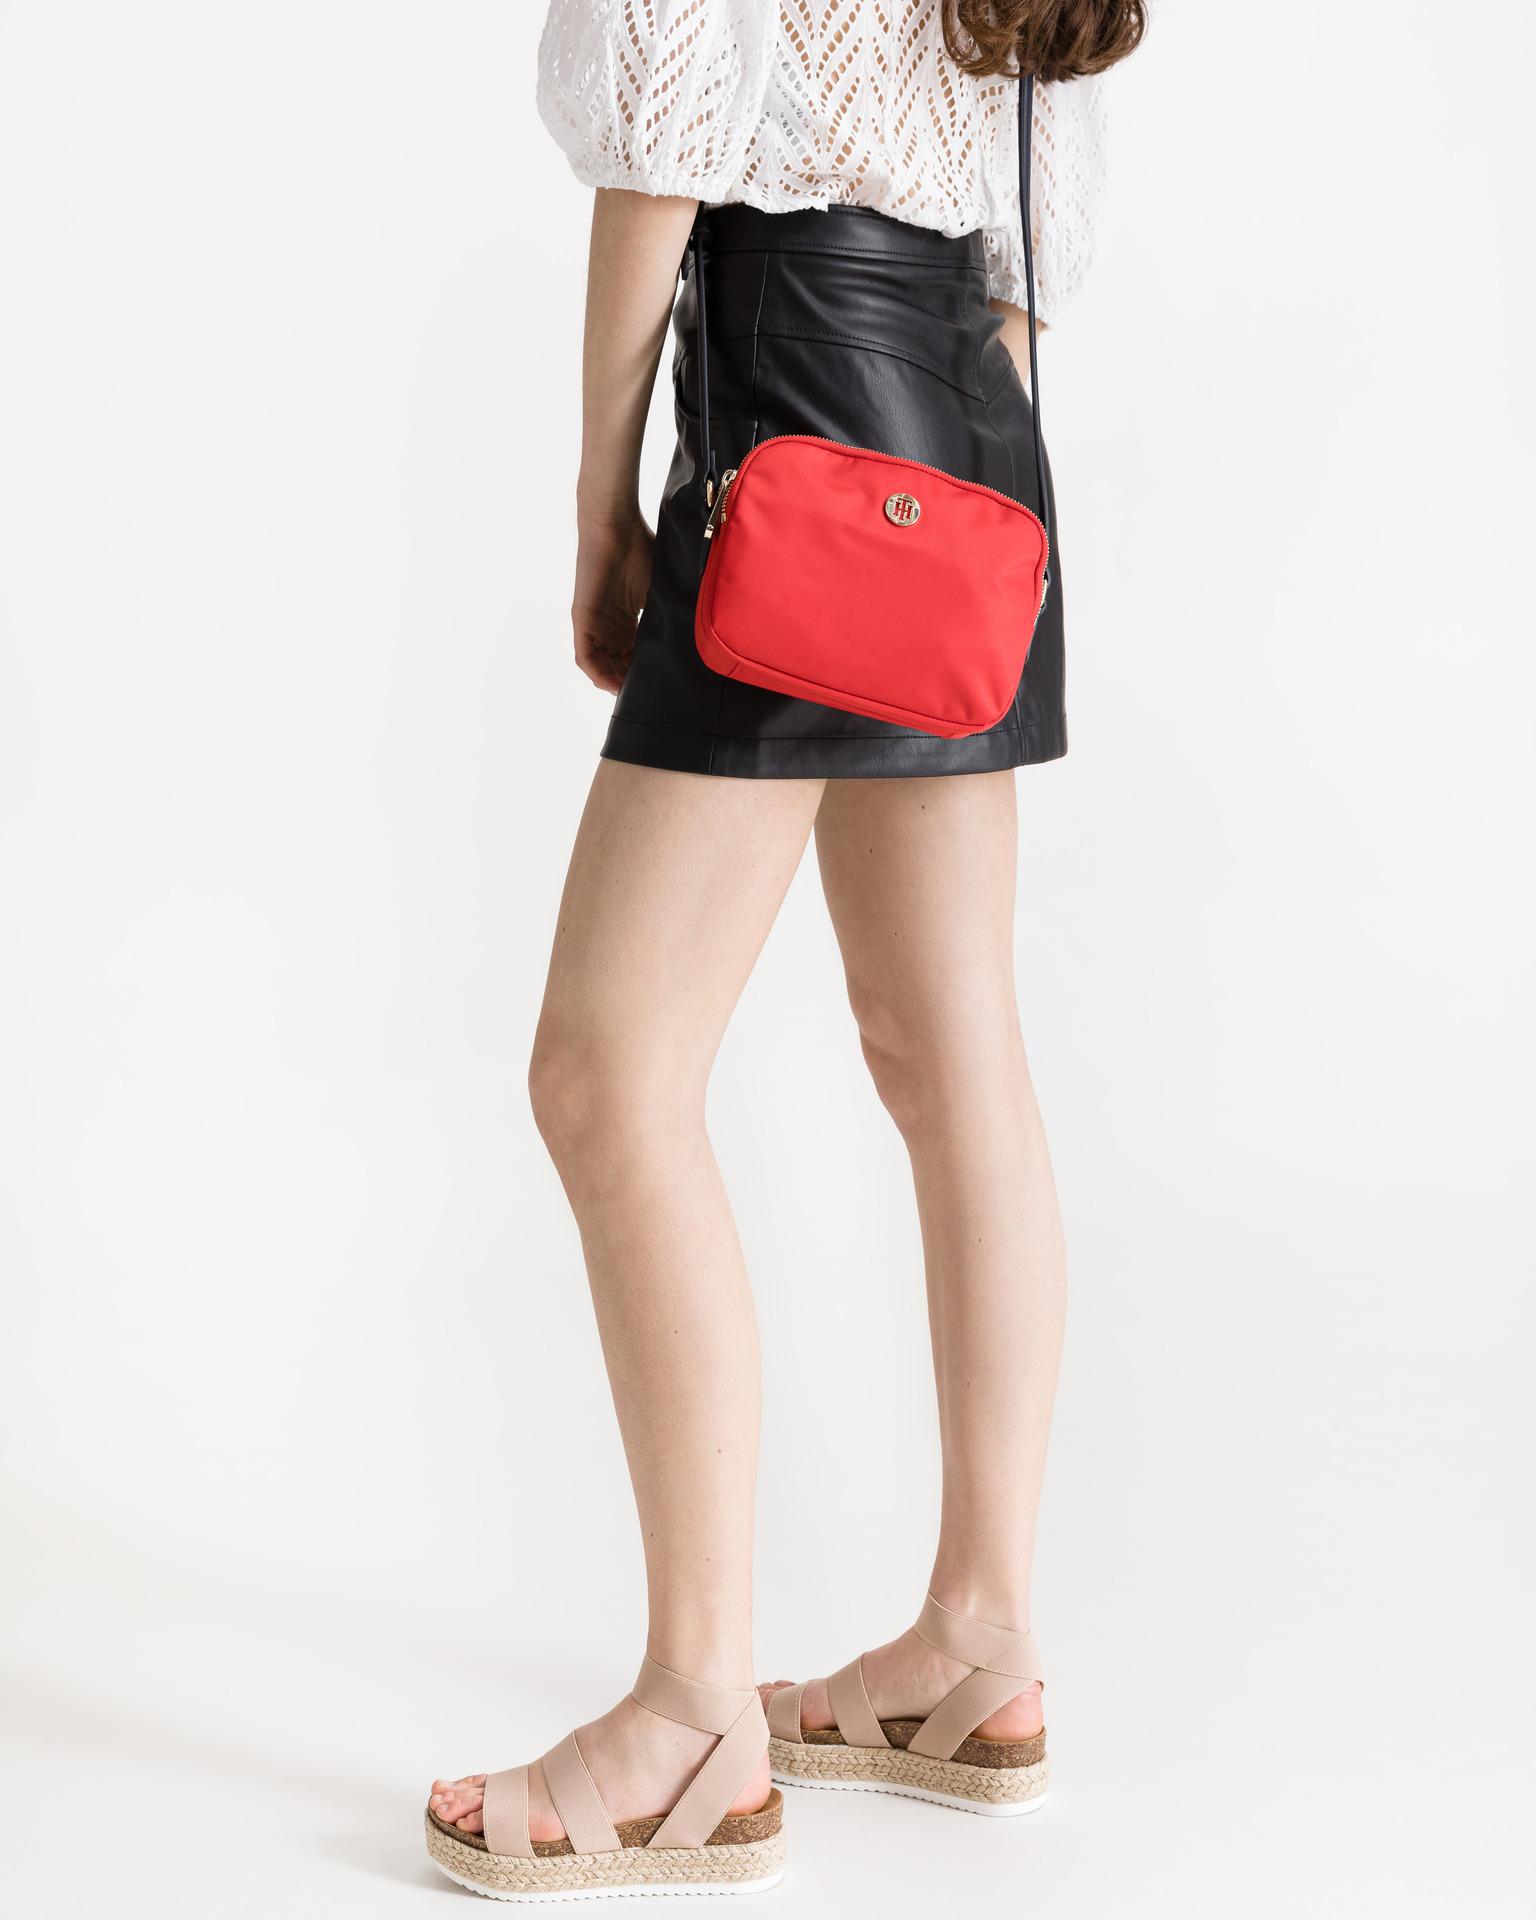 Tommy Hilfiger red crossbody handbag Poppy